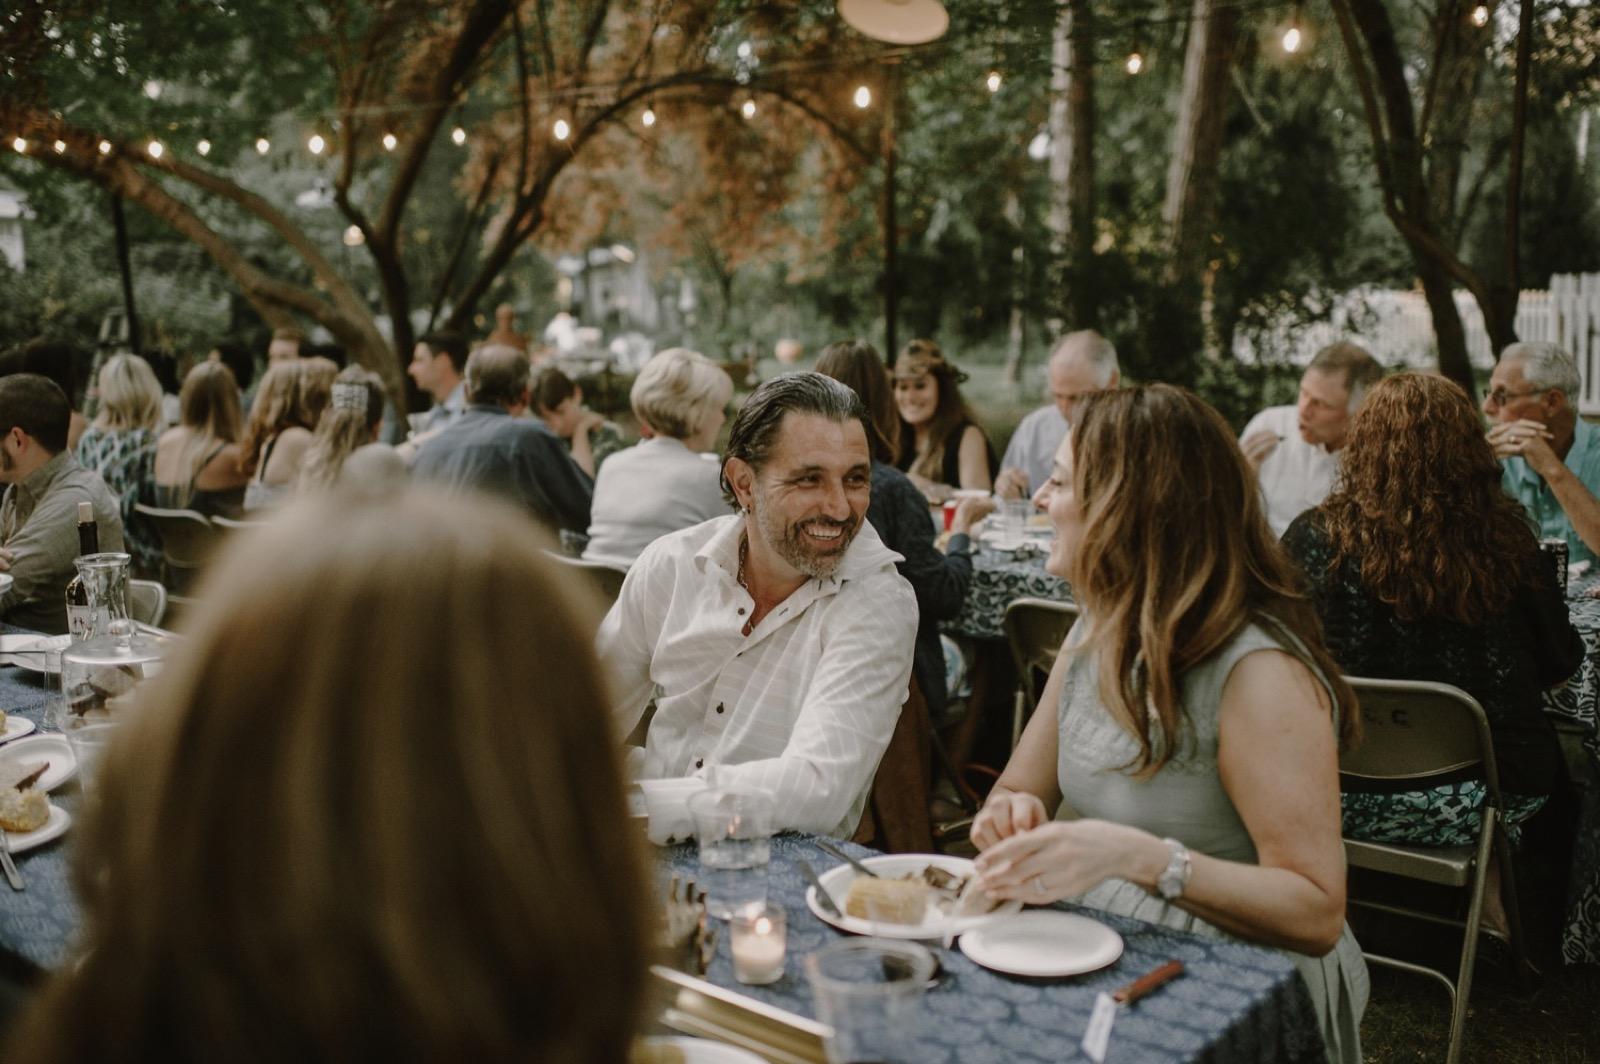 099_California_Ranch_Wedding251.jpg